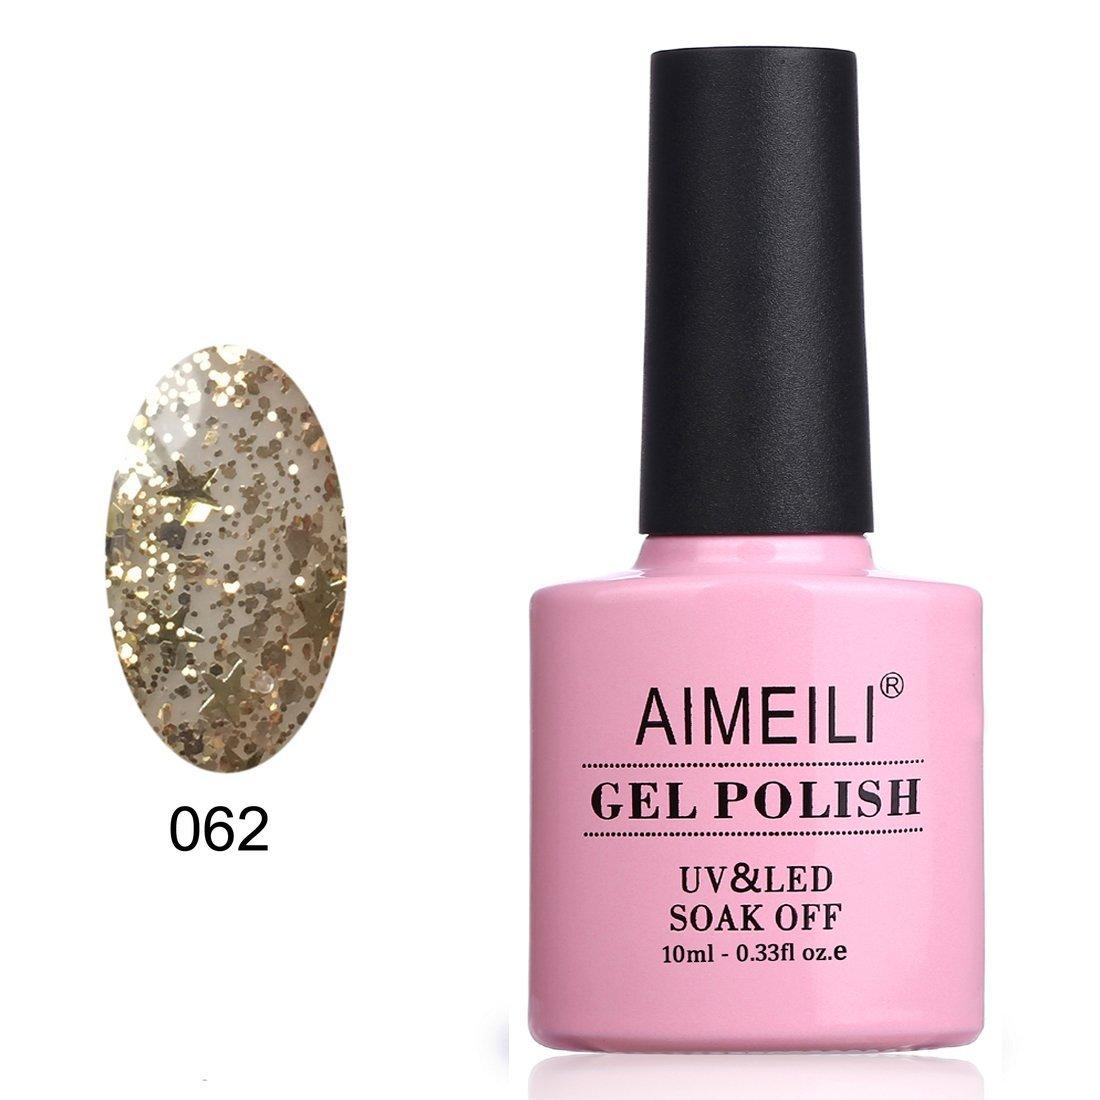 AIMEILI Soak Off UV LED Gel Nail Polish - Golden Superstar Glitter (062) 10ml